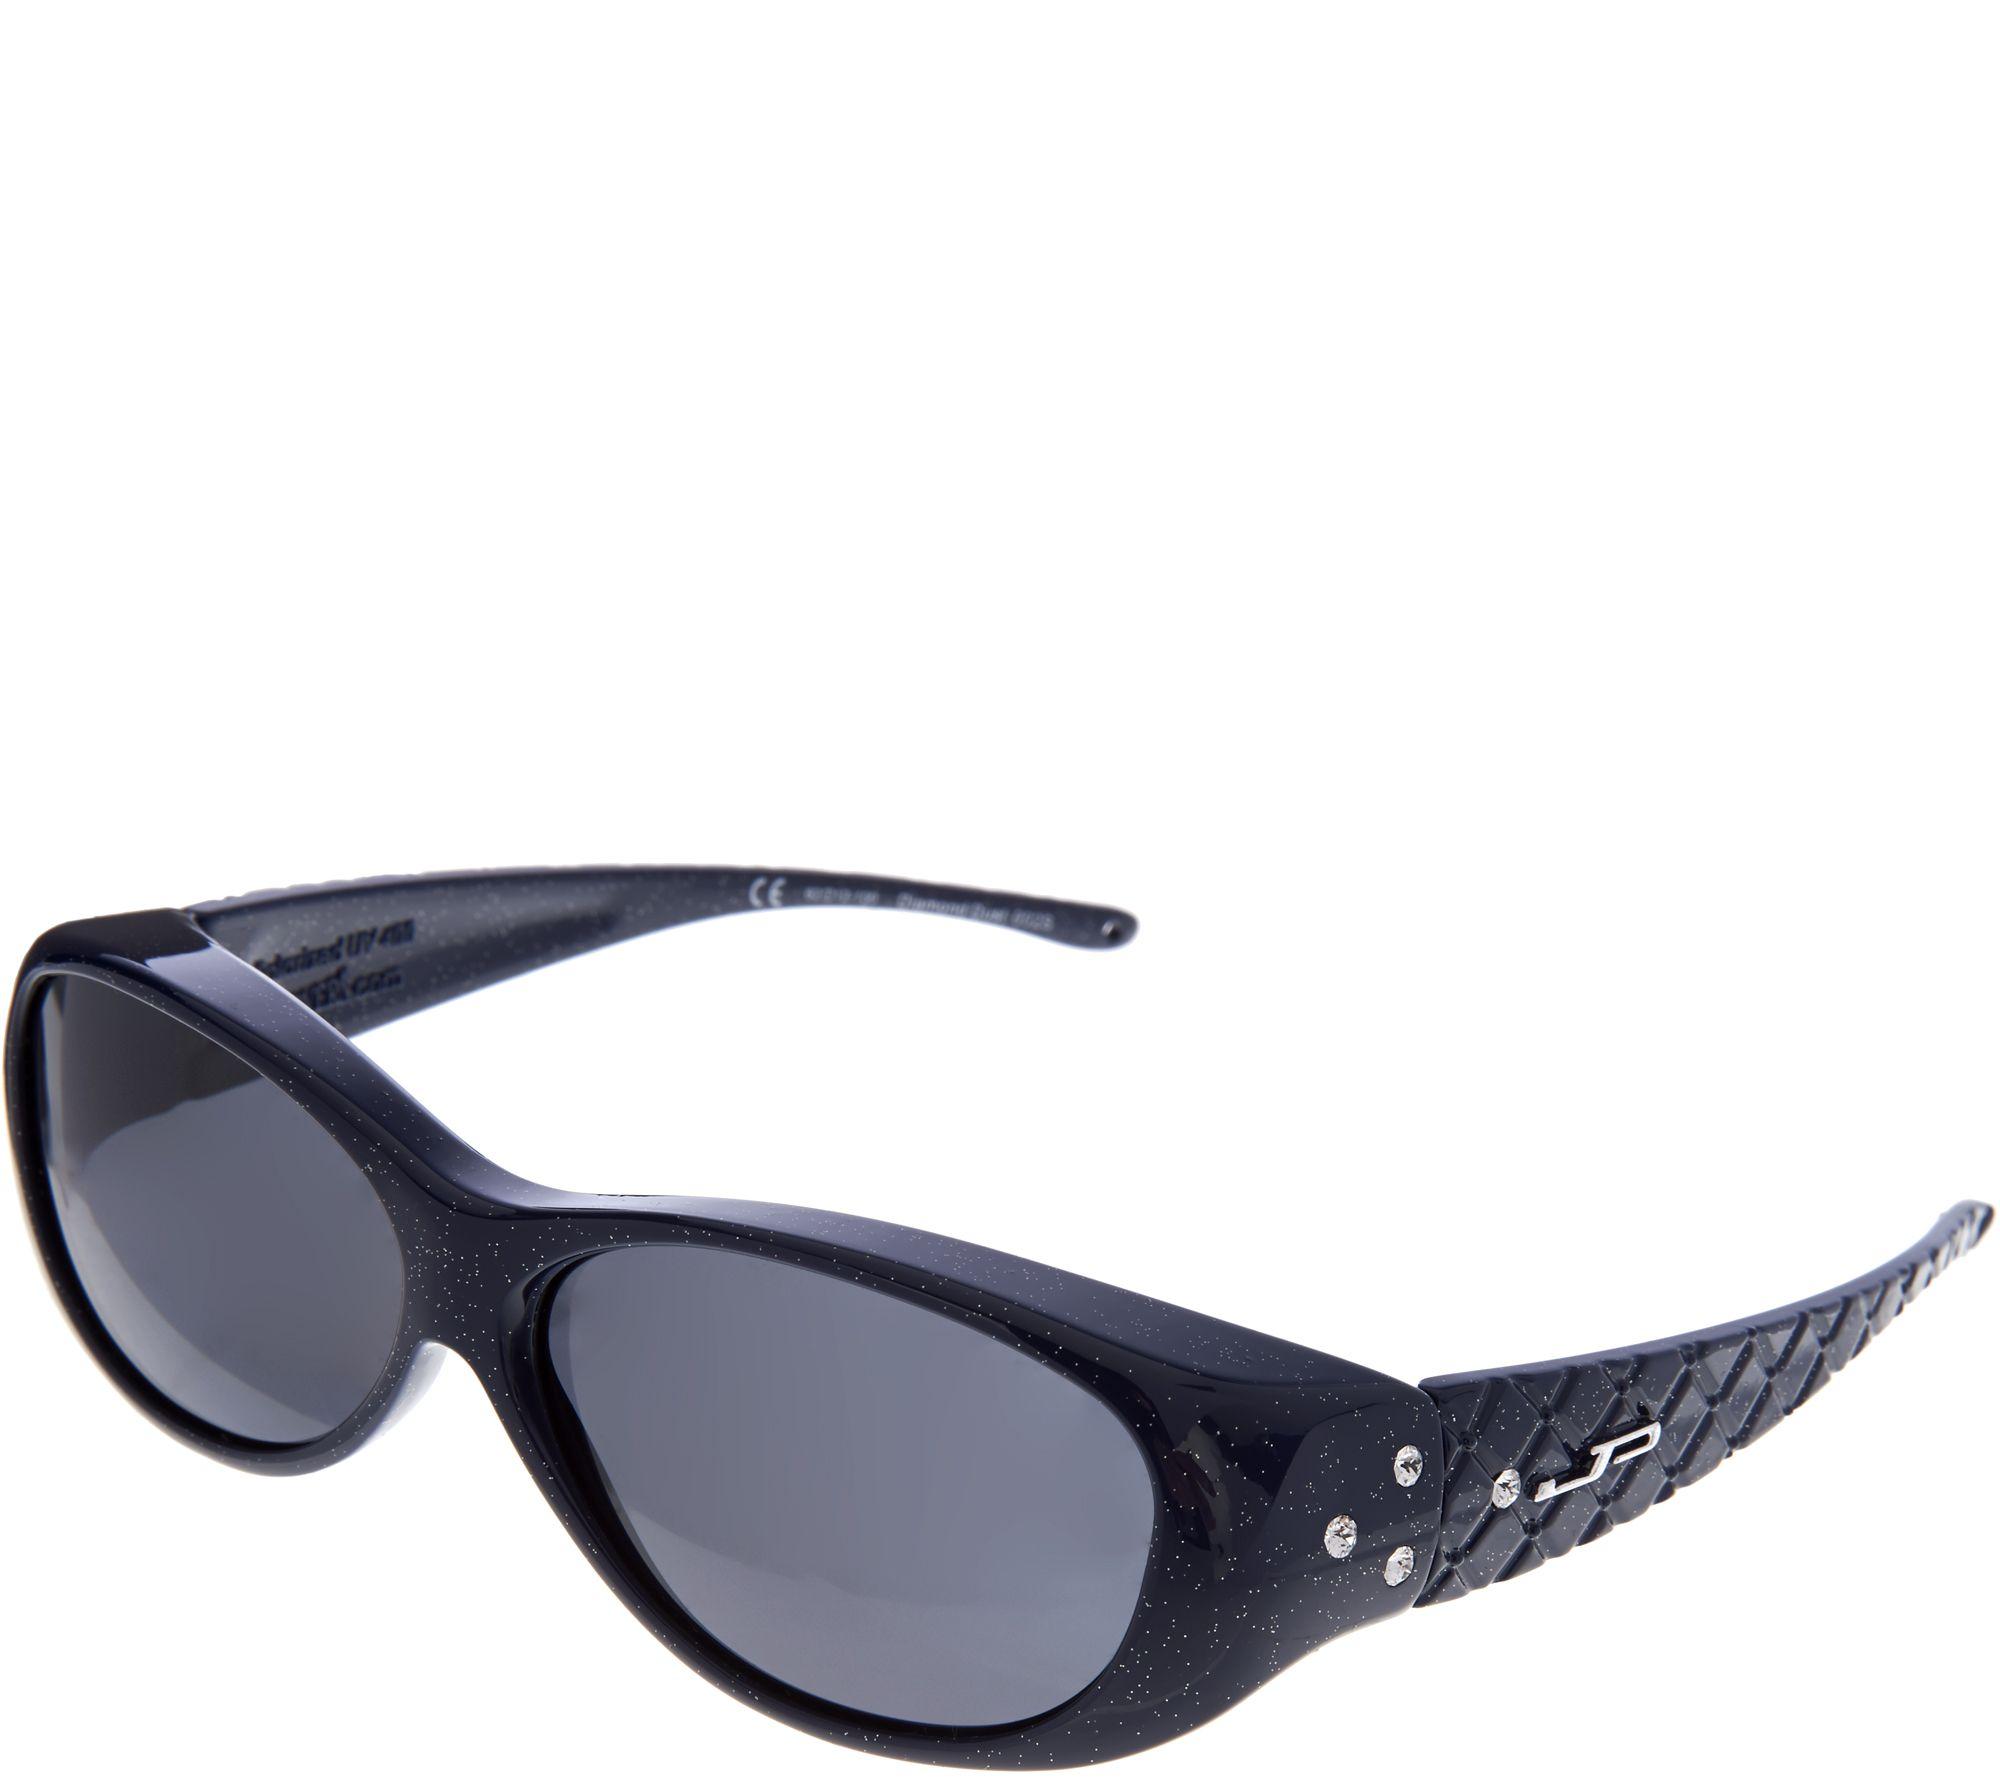 c22b873713 Jonathan Paul Fitovers Sunglasses - Bitterroot Public Library